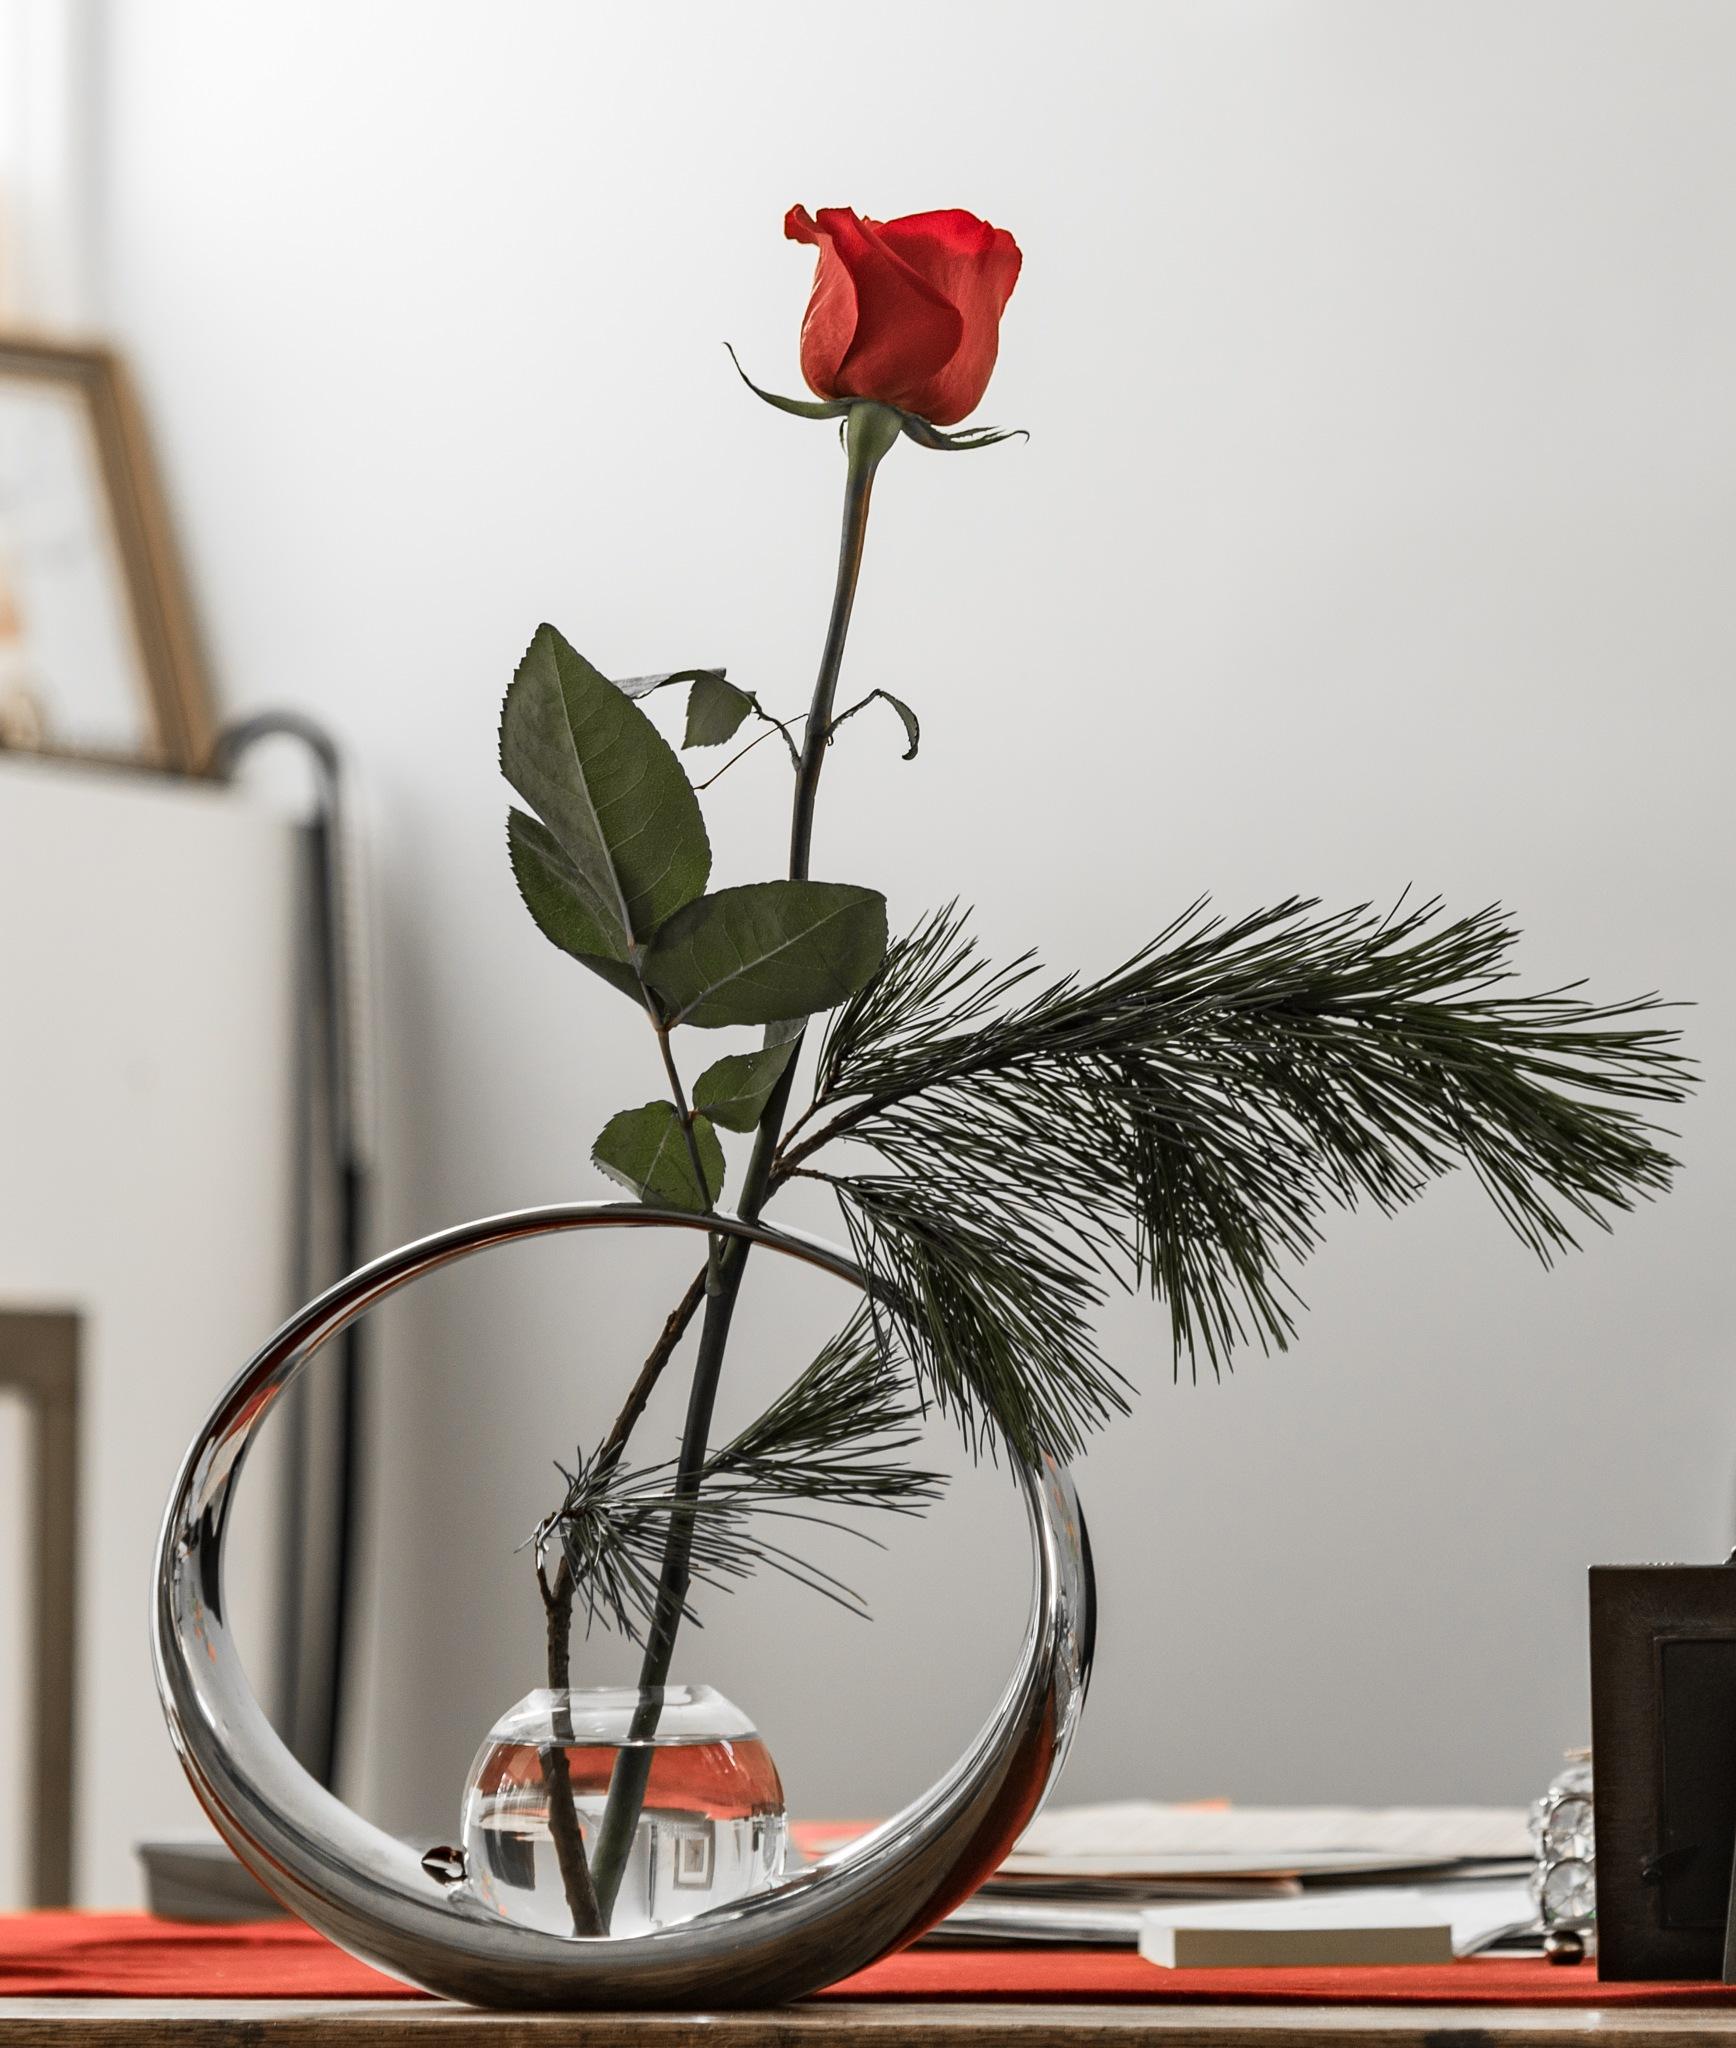 RED ROSE ON DESK by DrJohnHodgson